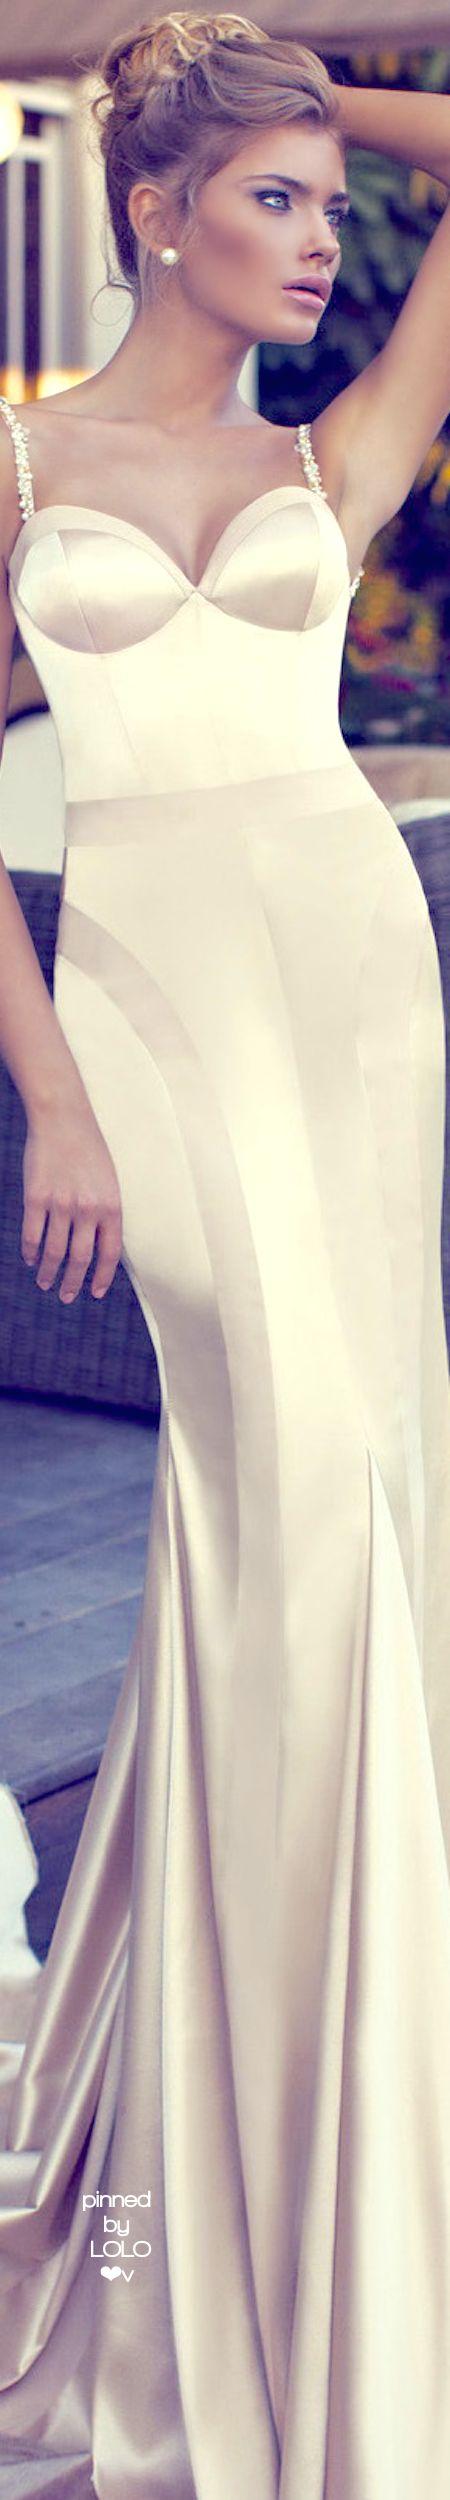 Nurit Hen Haute Couture | LOLO❤ white women fashion outfit clothing stylish apparel @roressclothes closet ideas